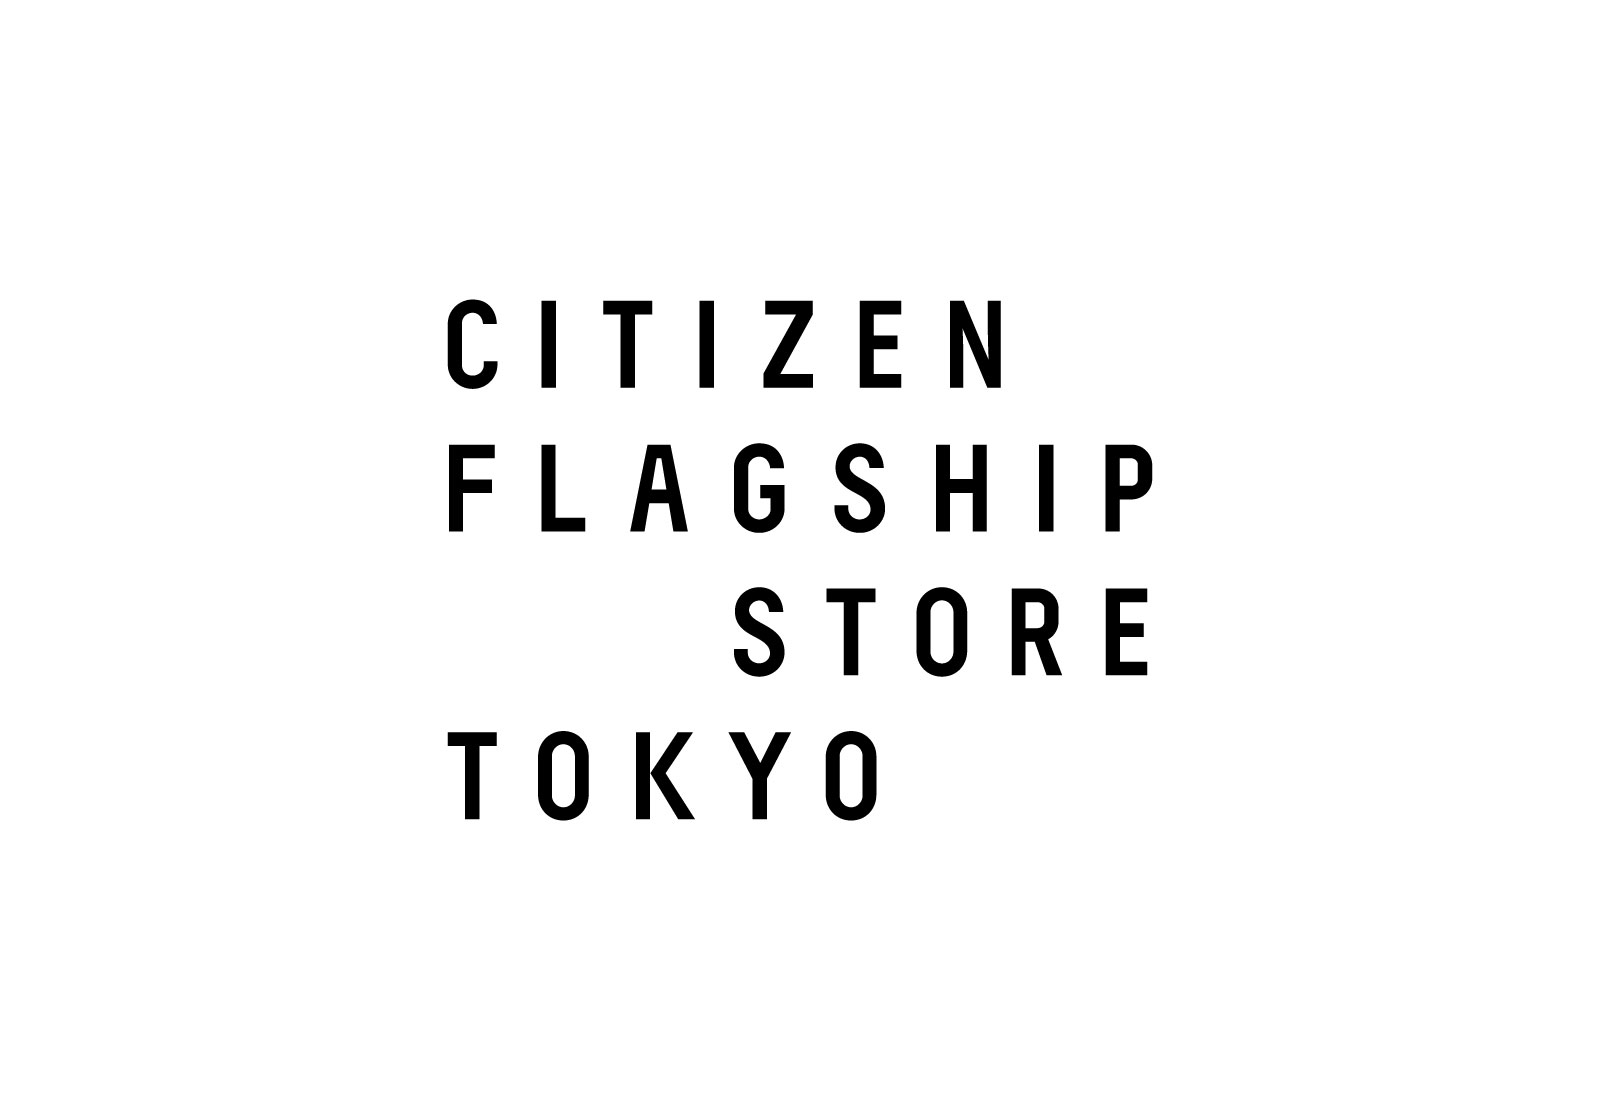 CITIZEN FLAGSHIP STORE TOKYO